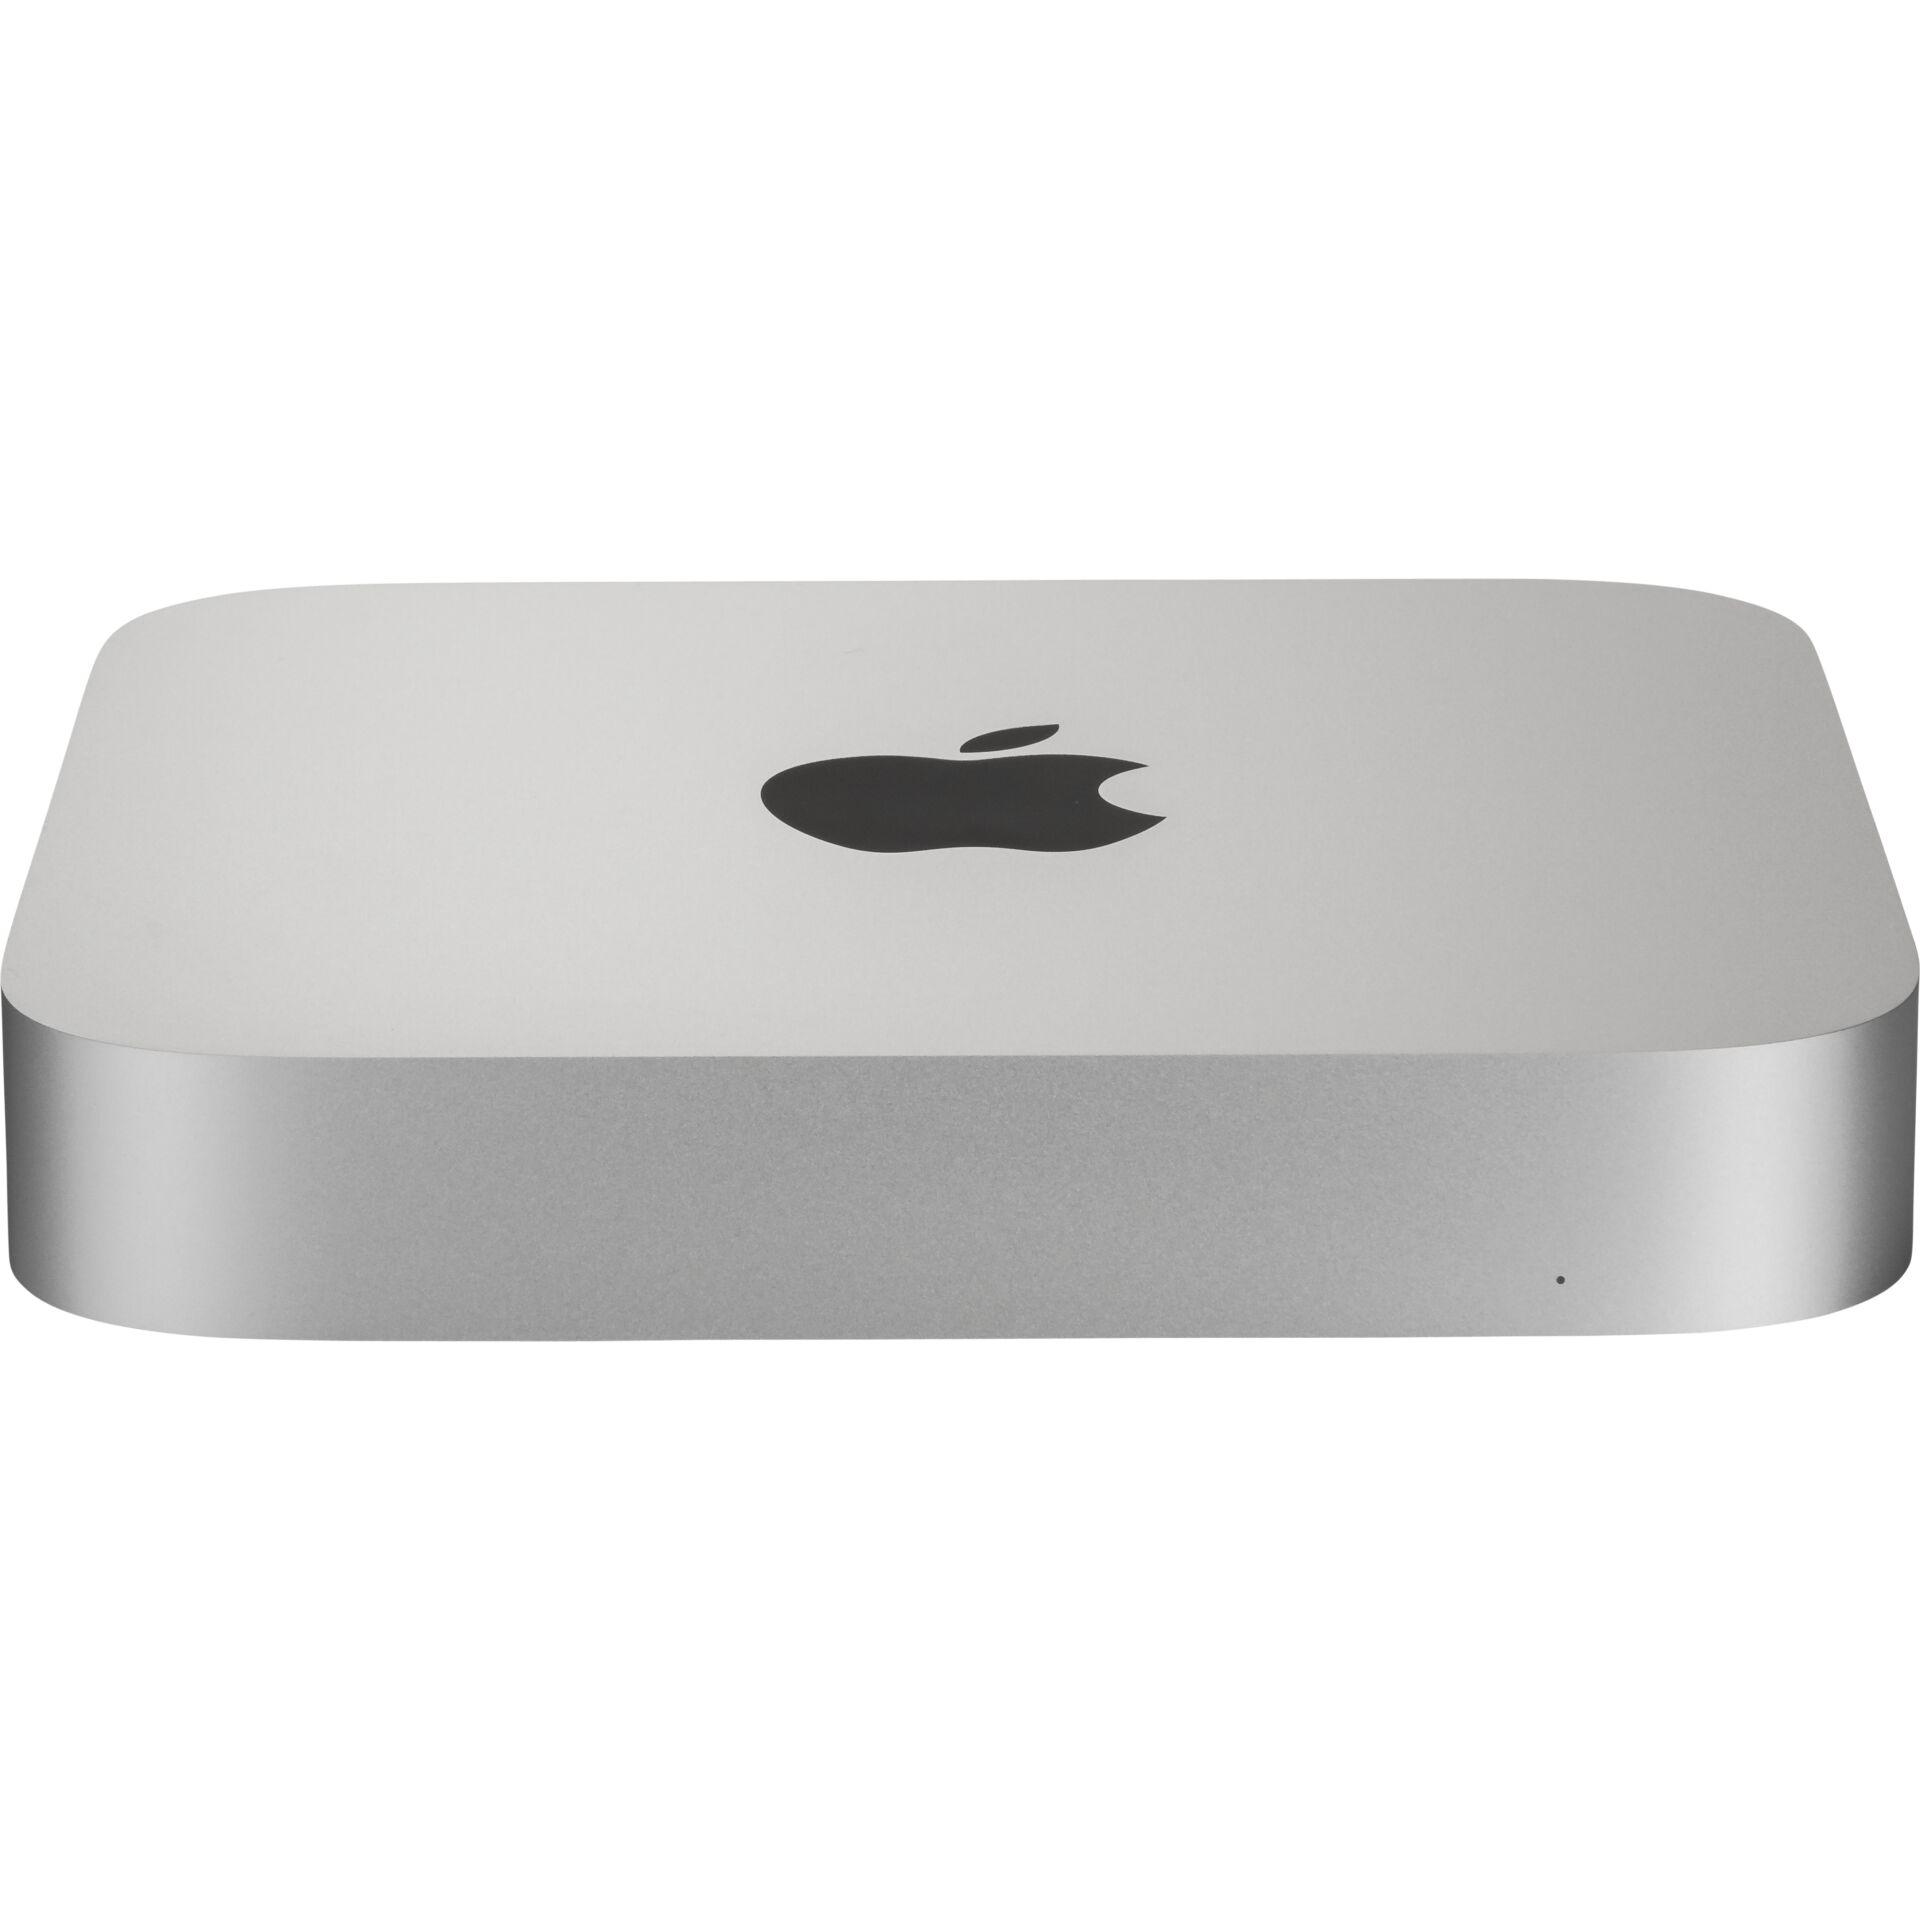 Apple Mac mini M1 8 core CPU 8GB 256GB SSD